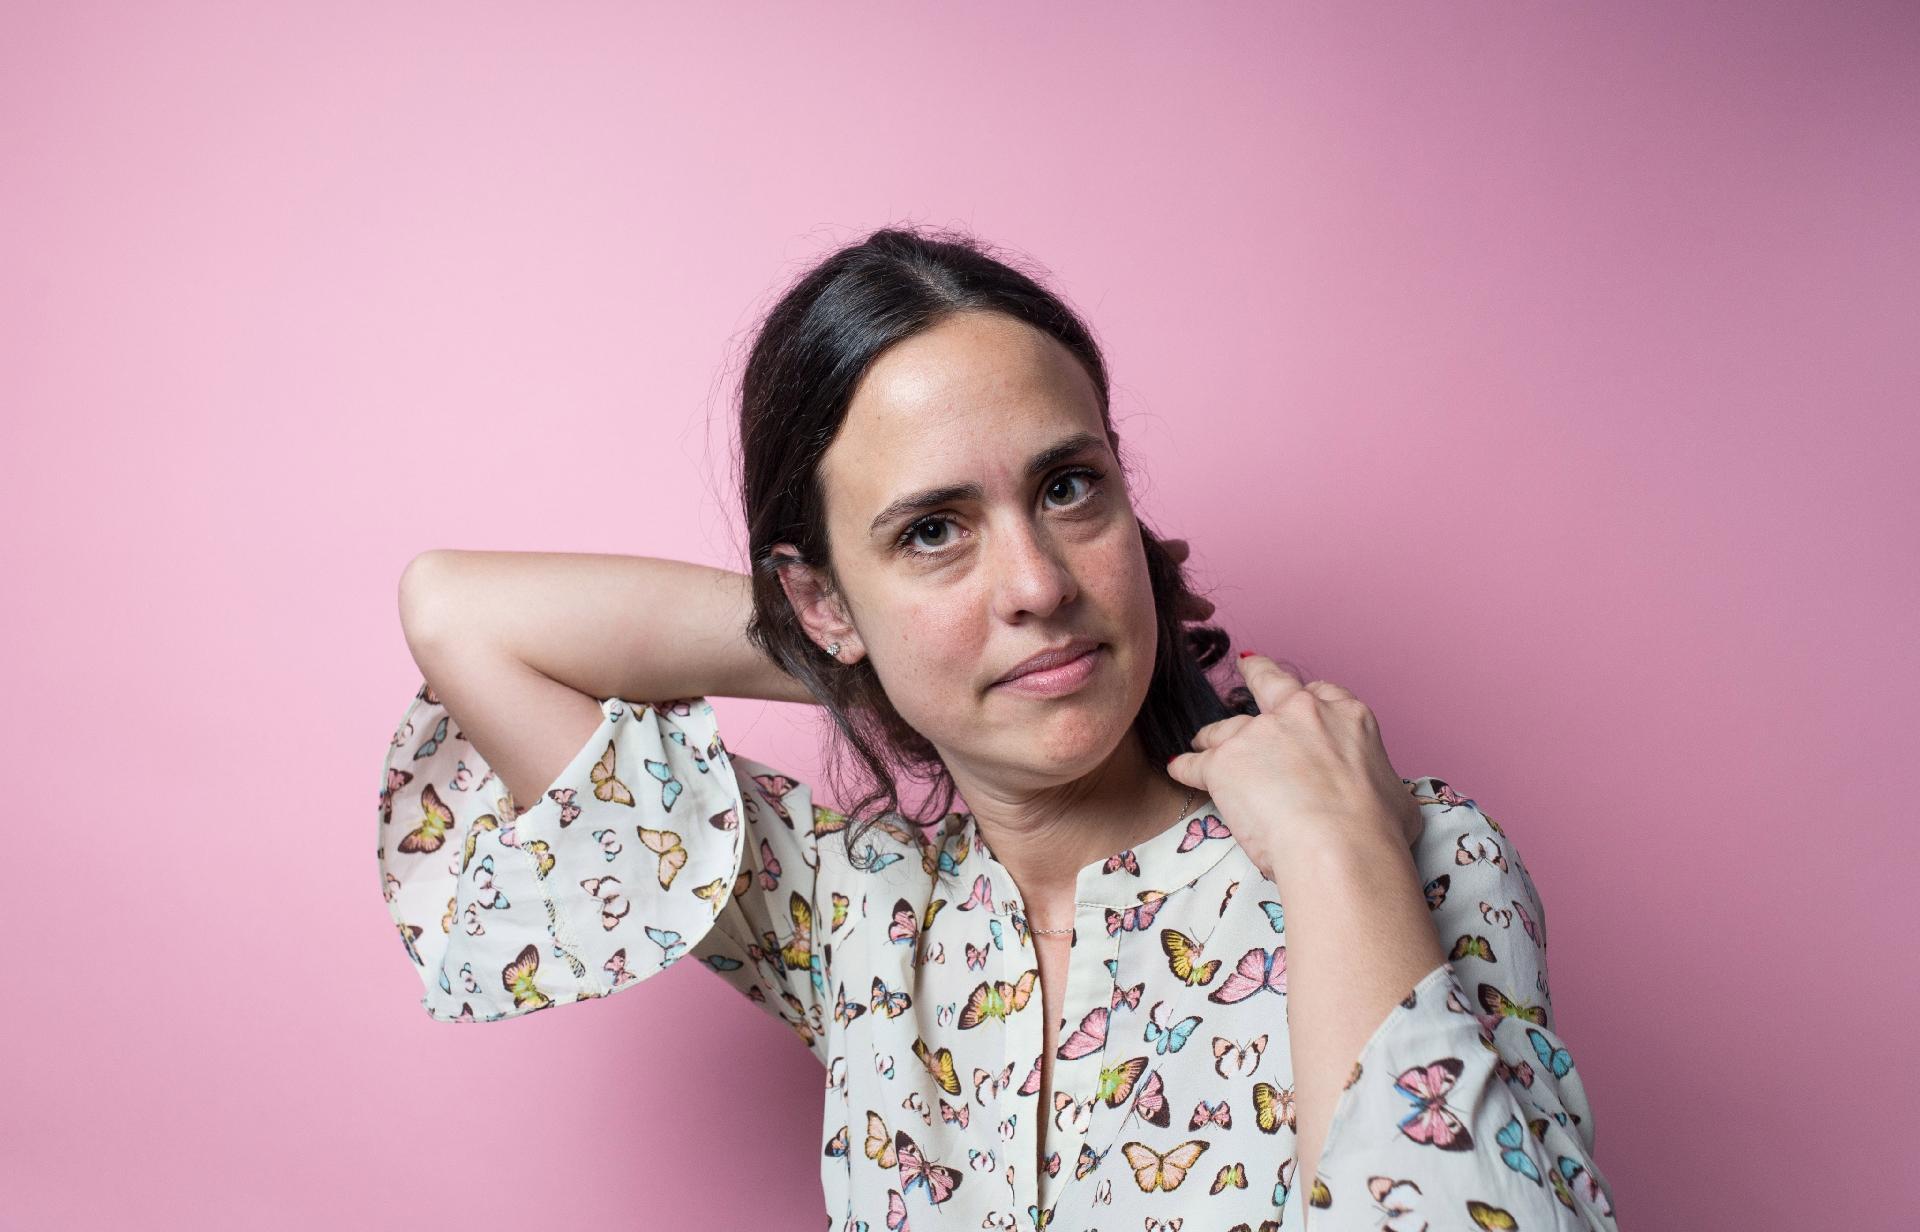 Amanda Perobelli/Universa